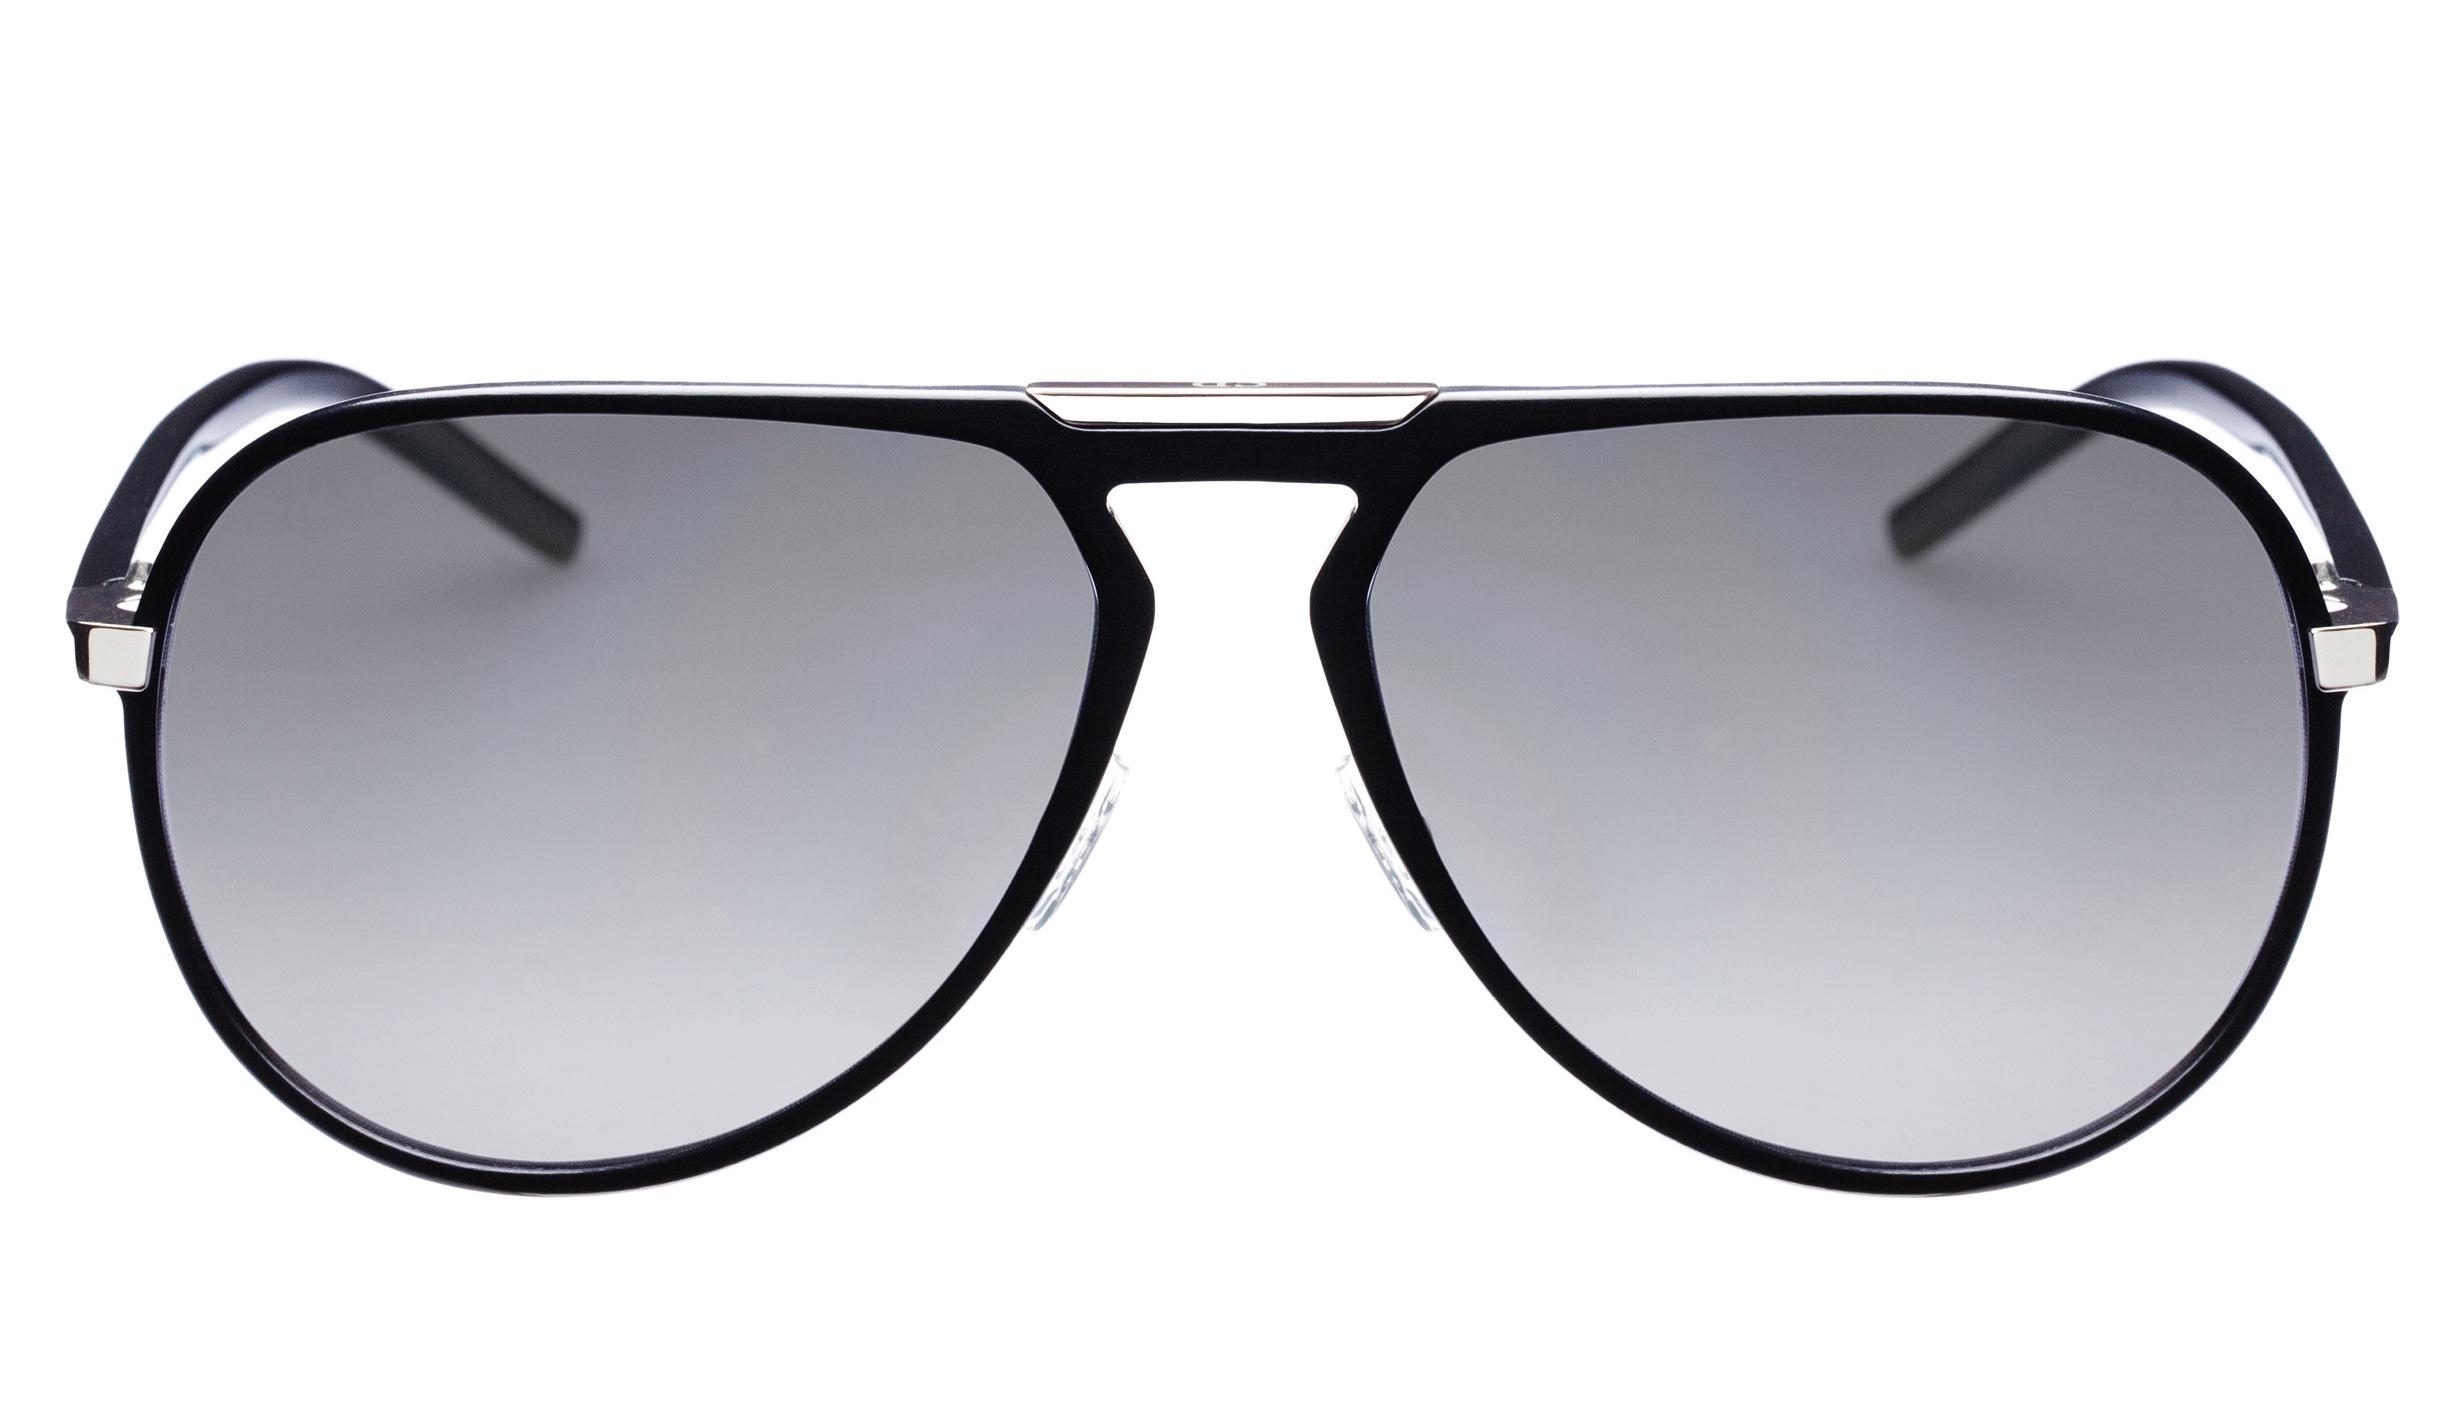 lunette dior homme quelle monture. Black Bedroom Furniture Sets. Home Design Ideas